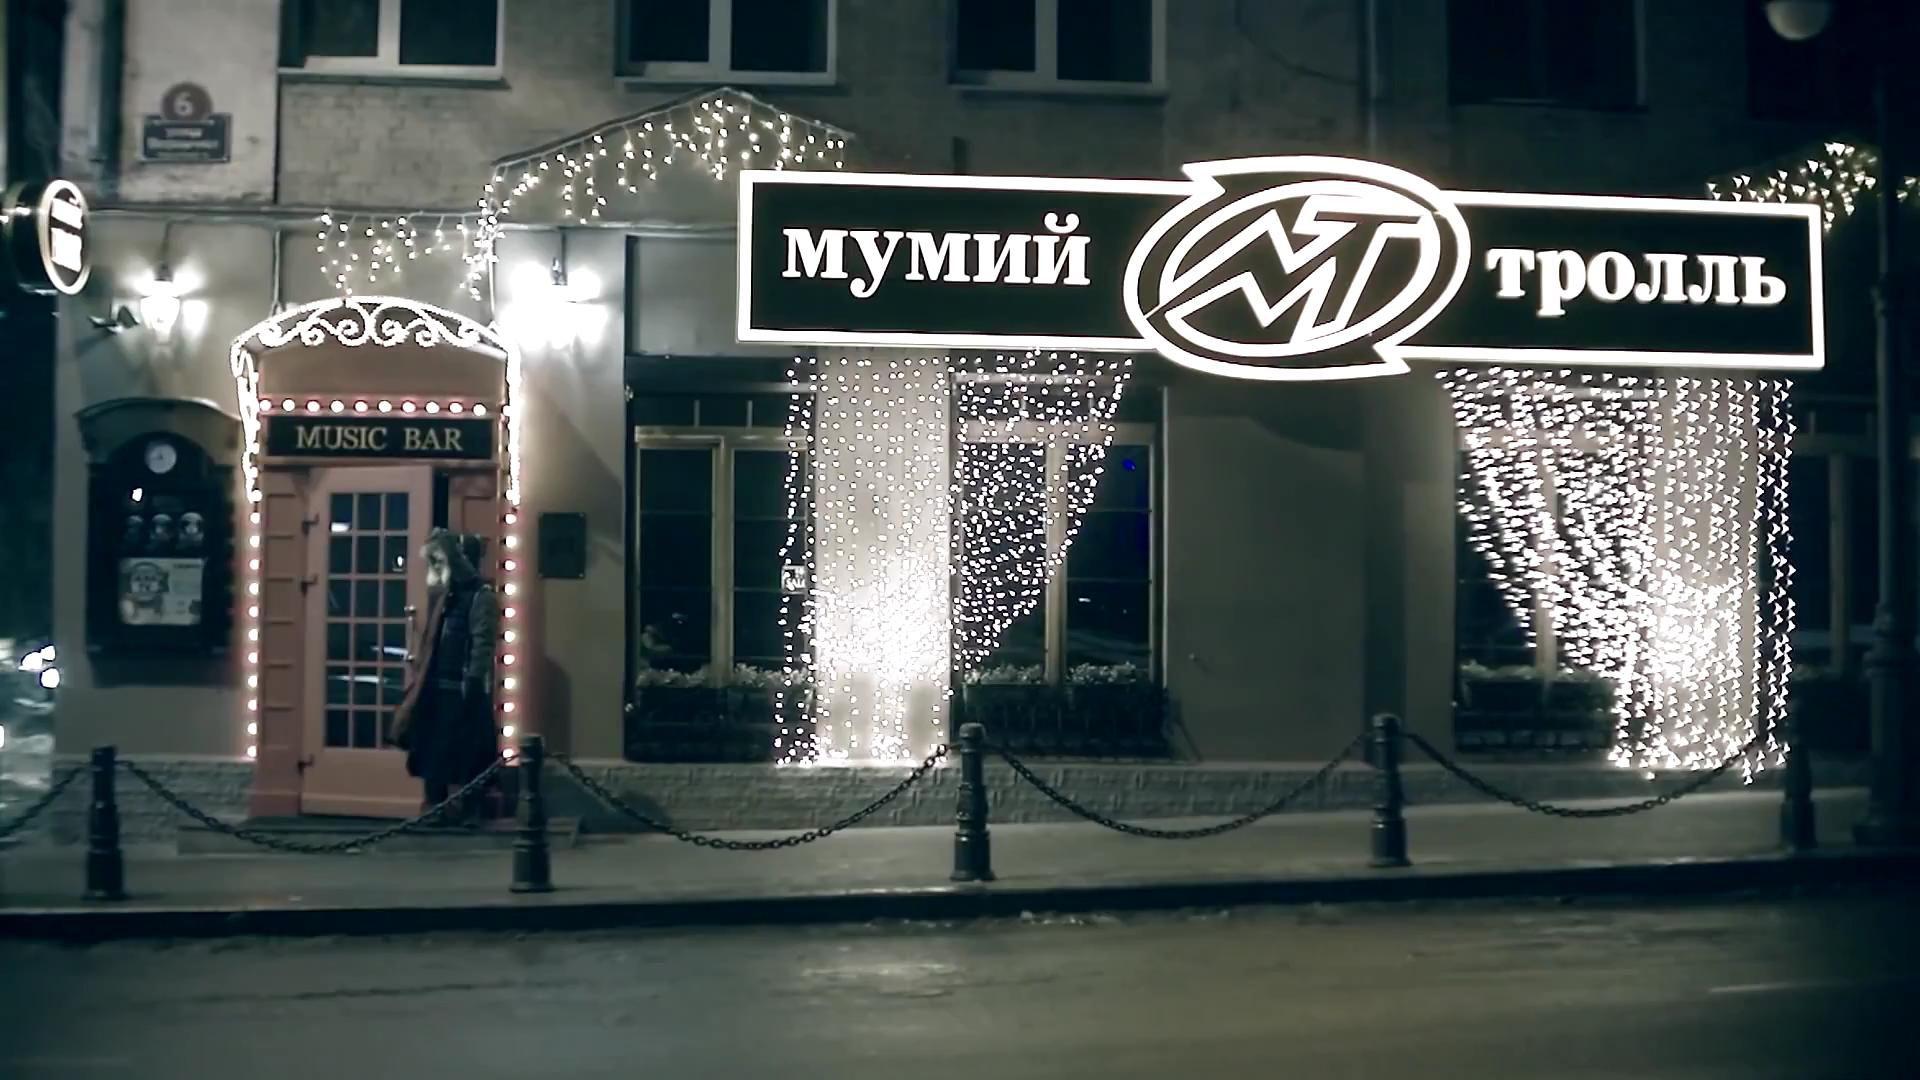 http://i5.imageban.ru/out/2013/05/23/97763b6ec2c43ba2bddc8b28600b686b.jpg